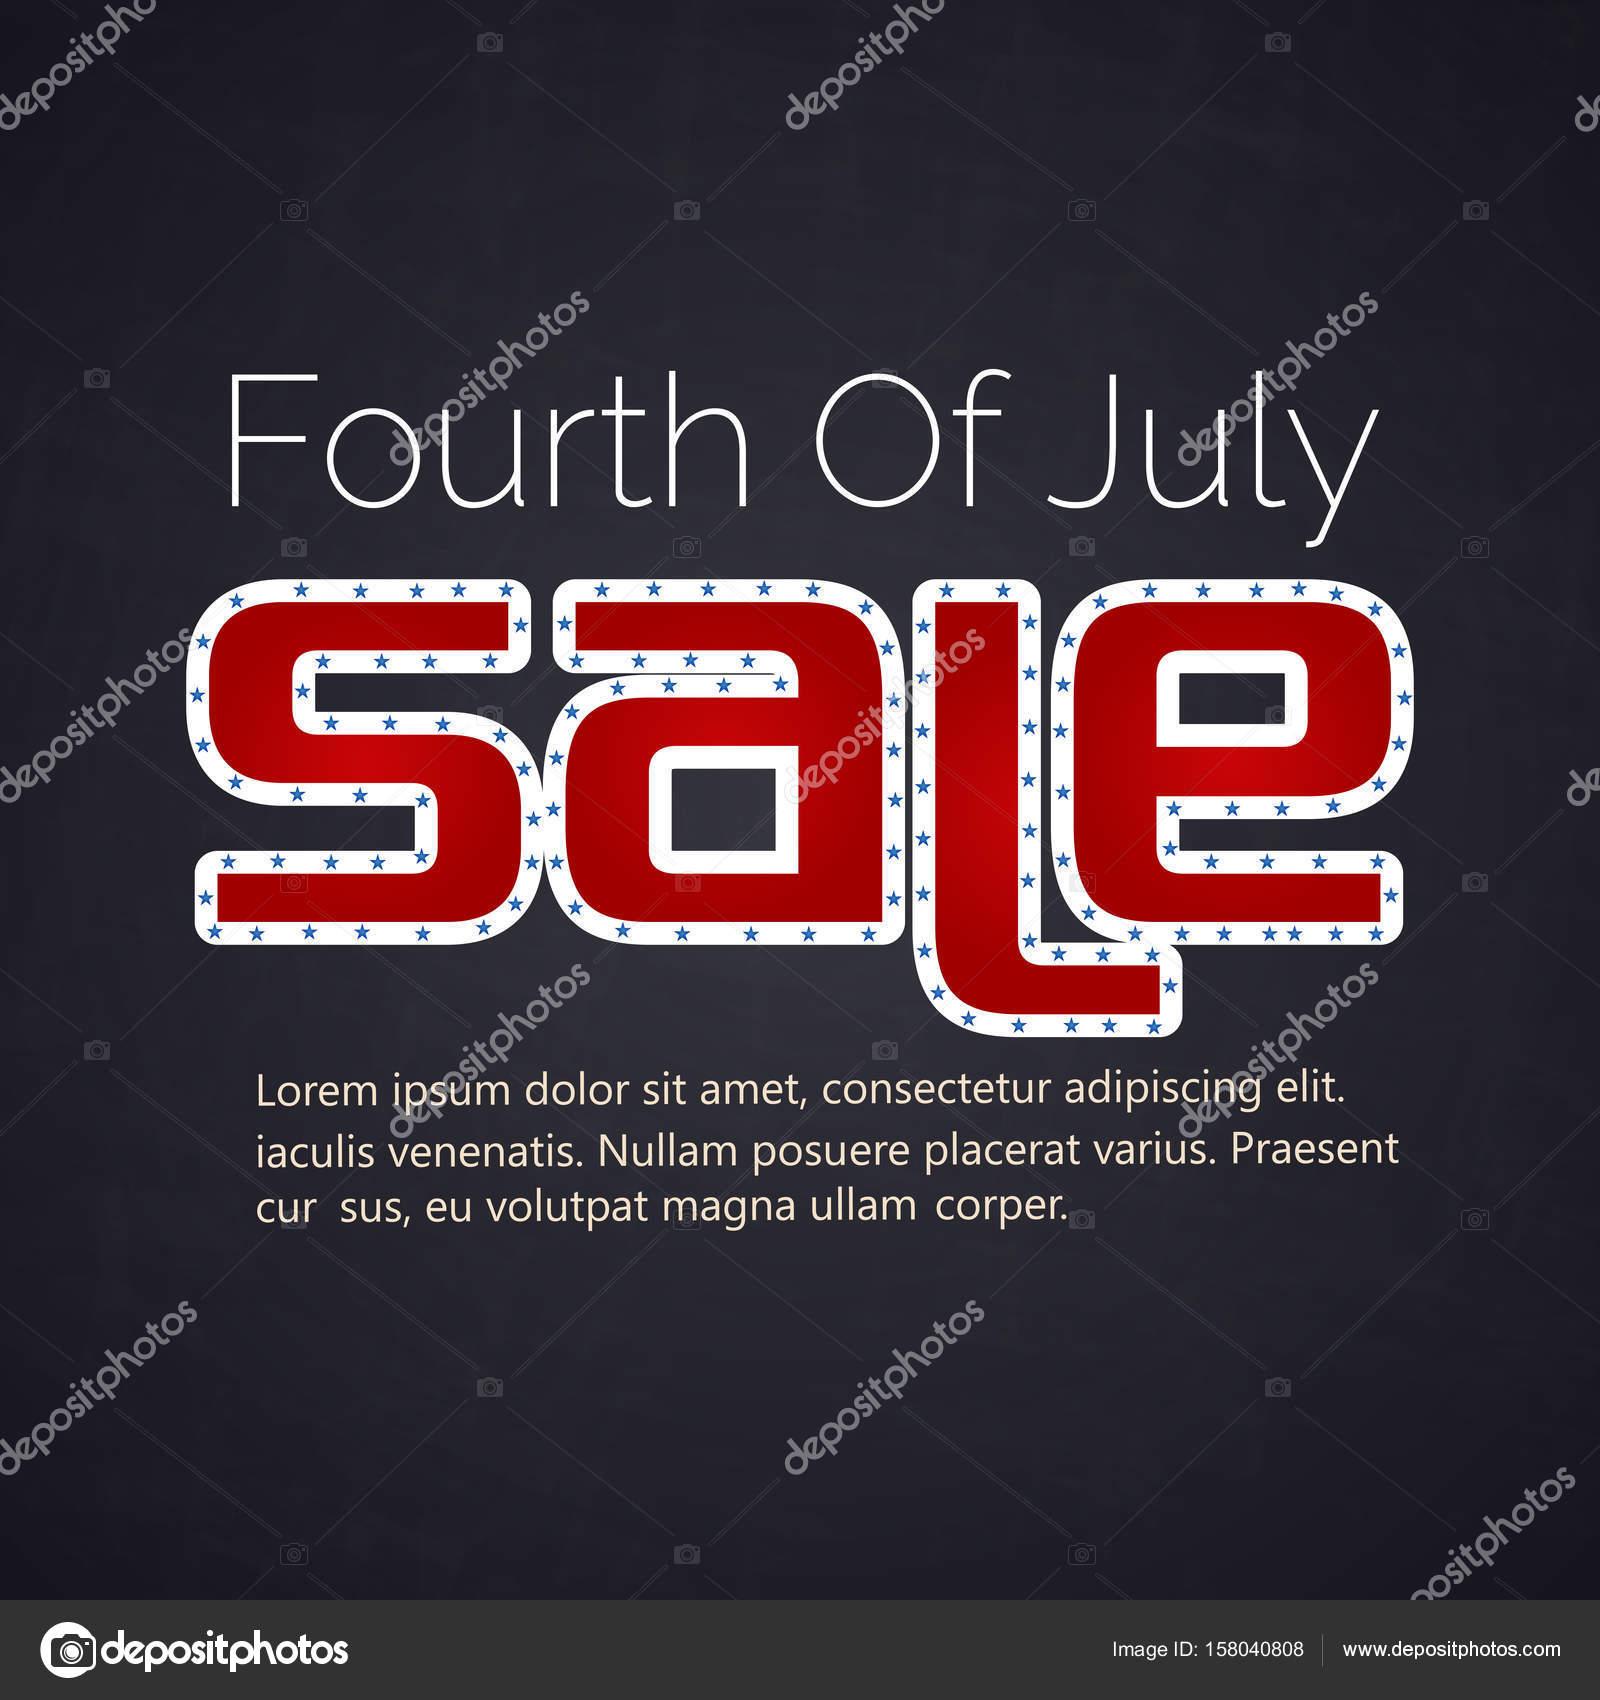 4 de julio venta Resumen — Vector de stock © awdsin.gmail.com #158040808